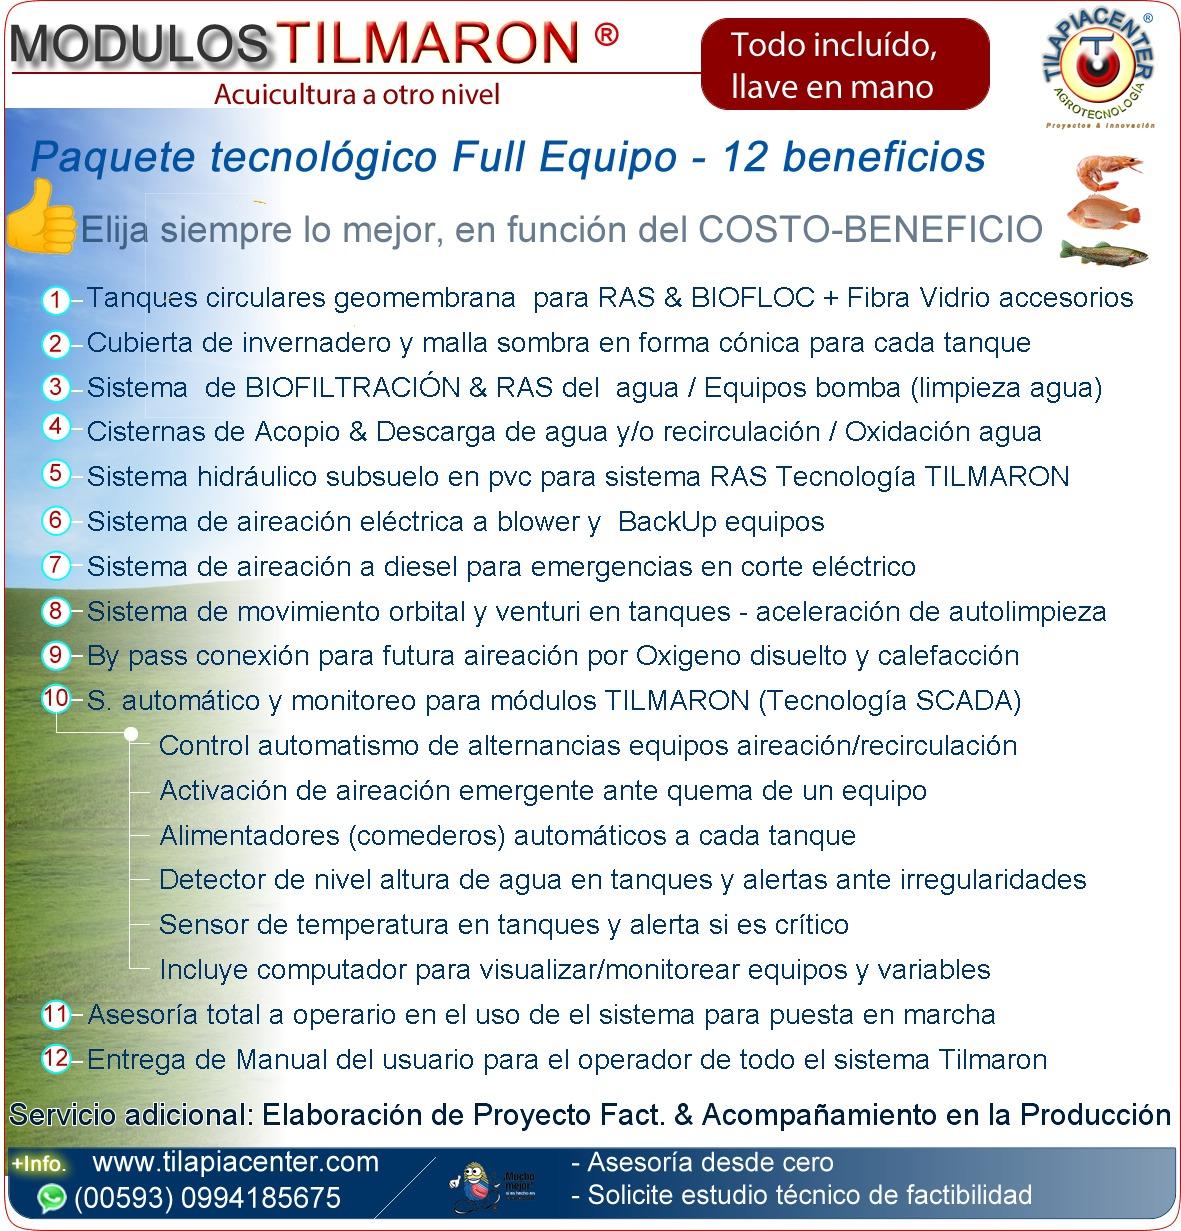 Lista de componentes de modulos RAS de acuicultura tecnificada